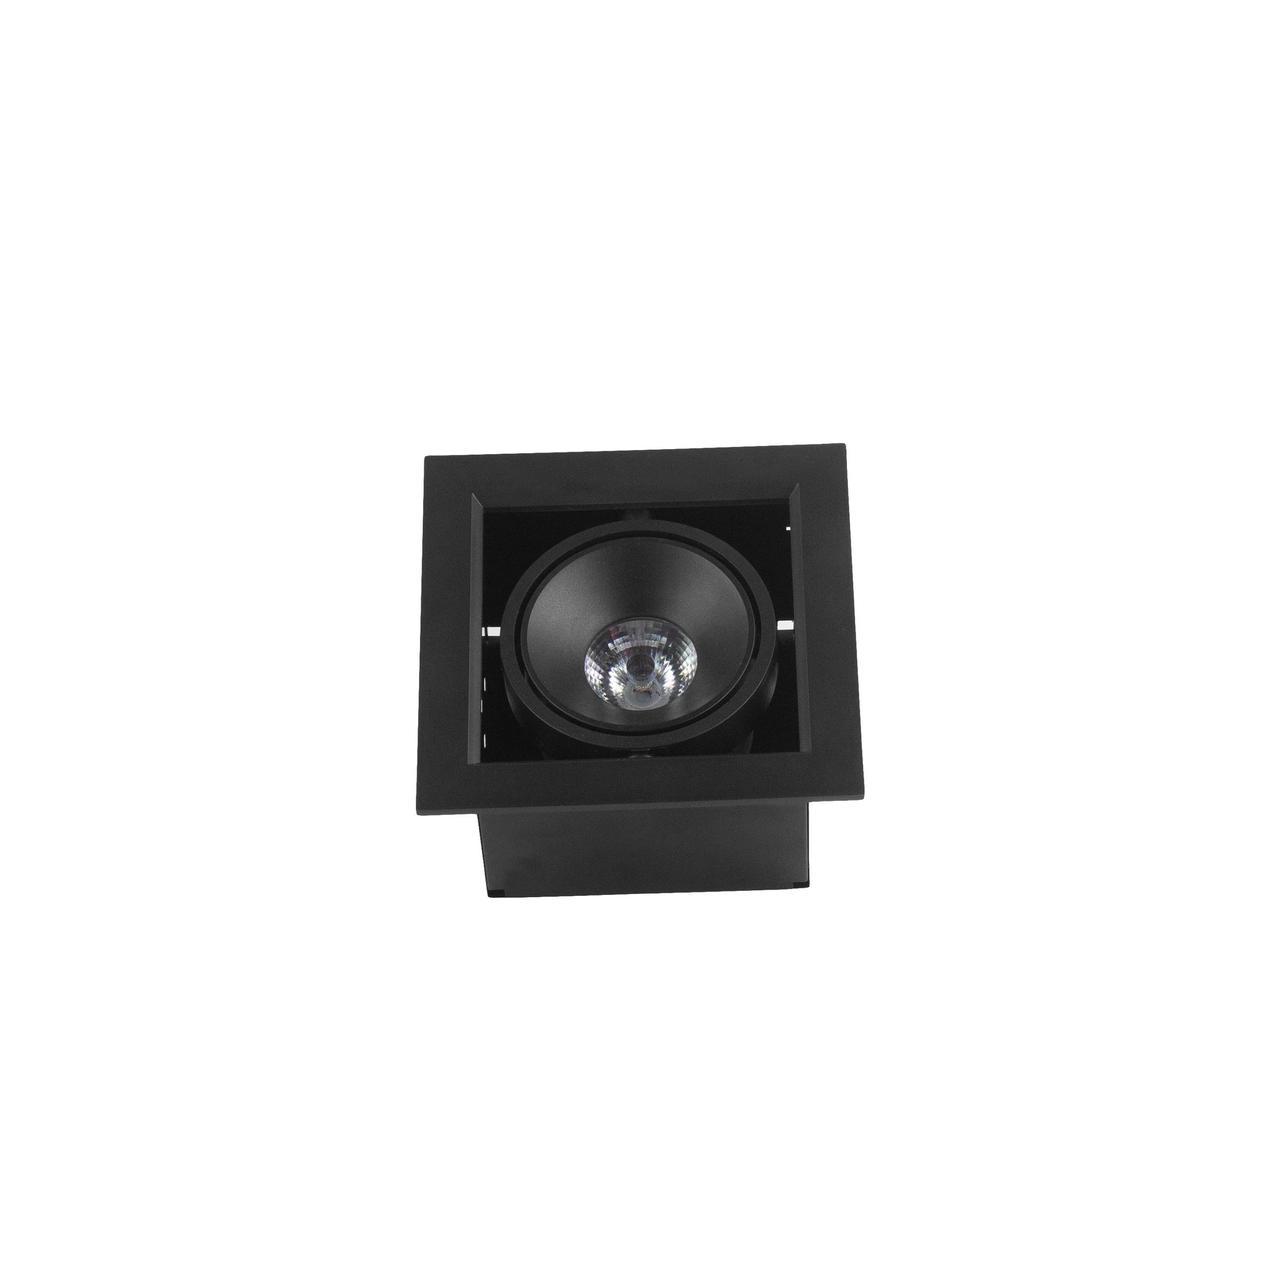 Точечный светильник Skarlat  BX07-1-LED 7W BK 4000K